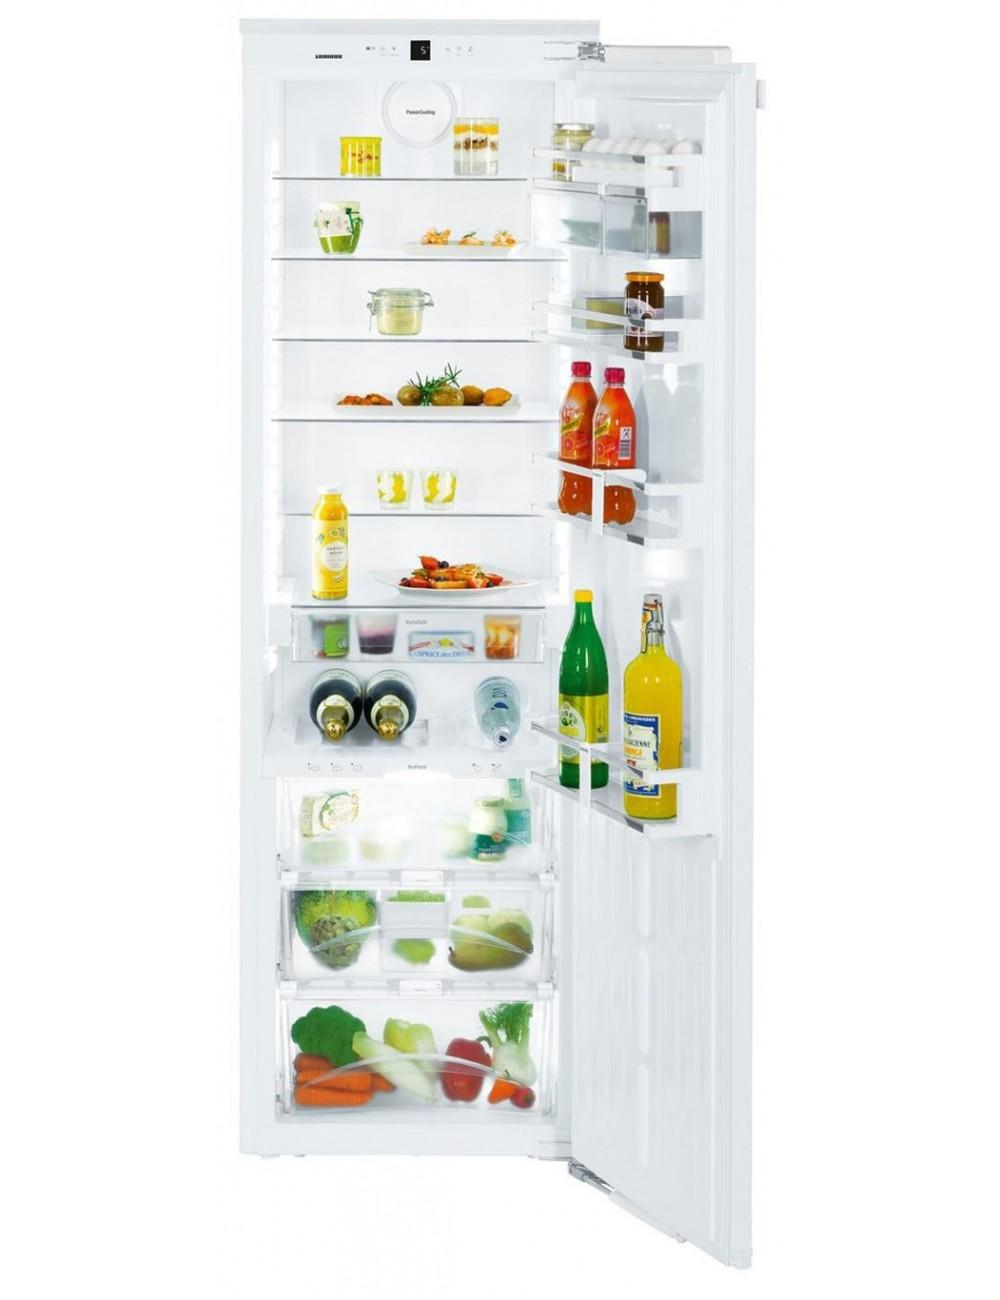 Frigorífico 1 puerta integrable LIEBHERR IKB-3560 Premium BioFresh